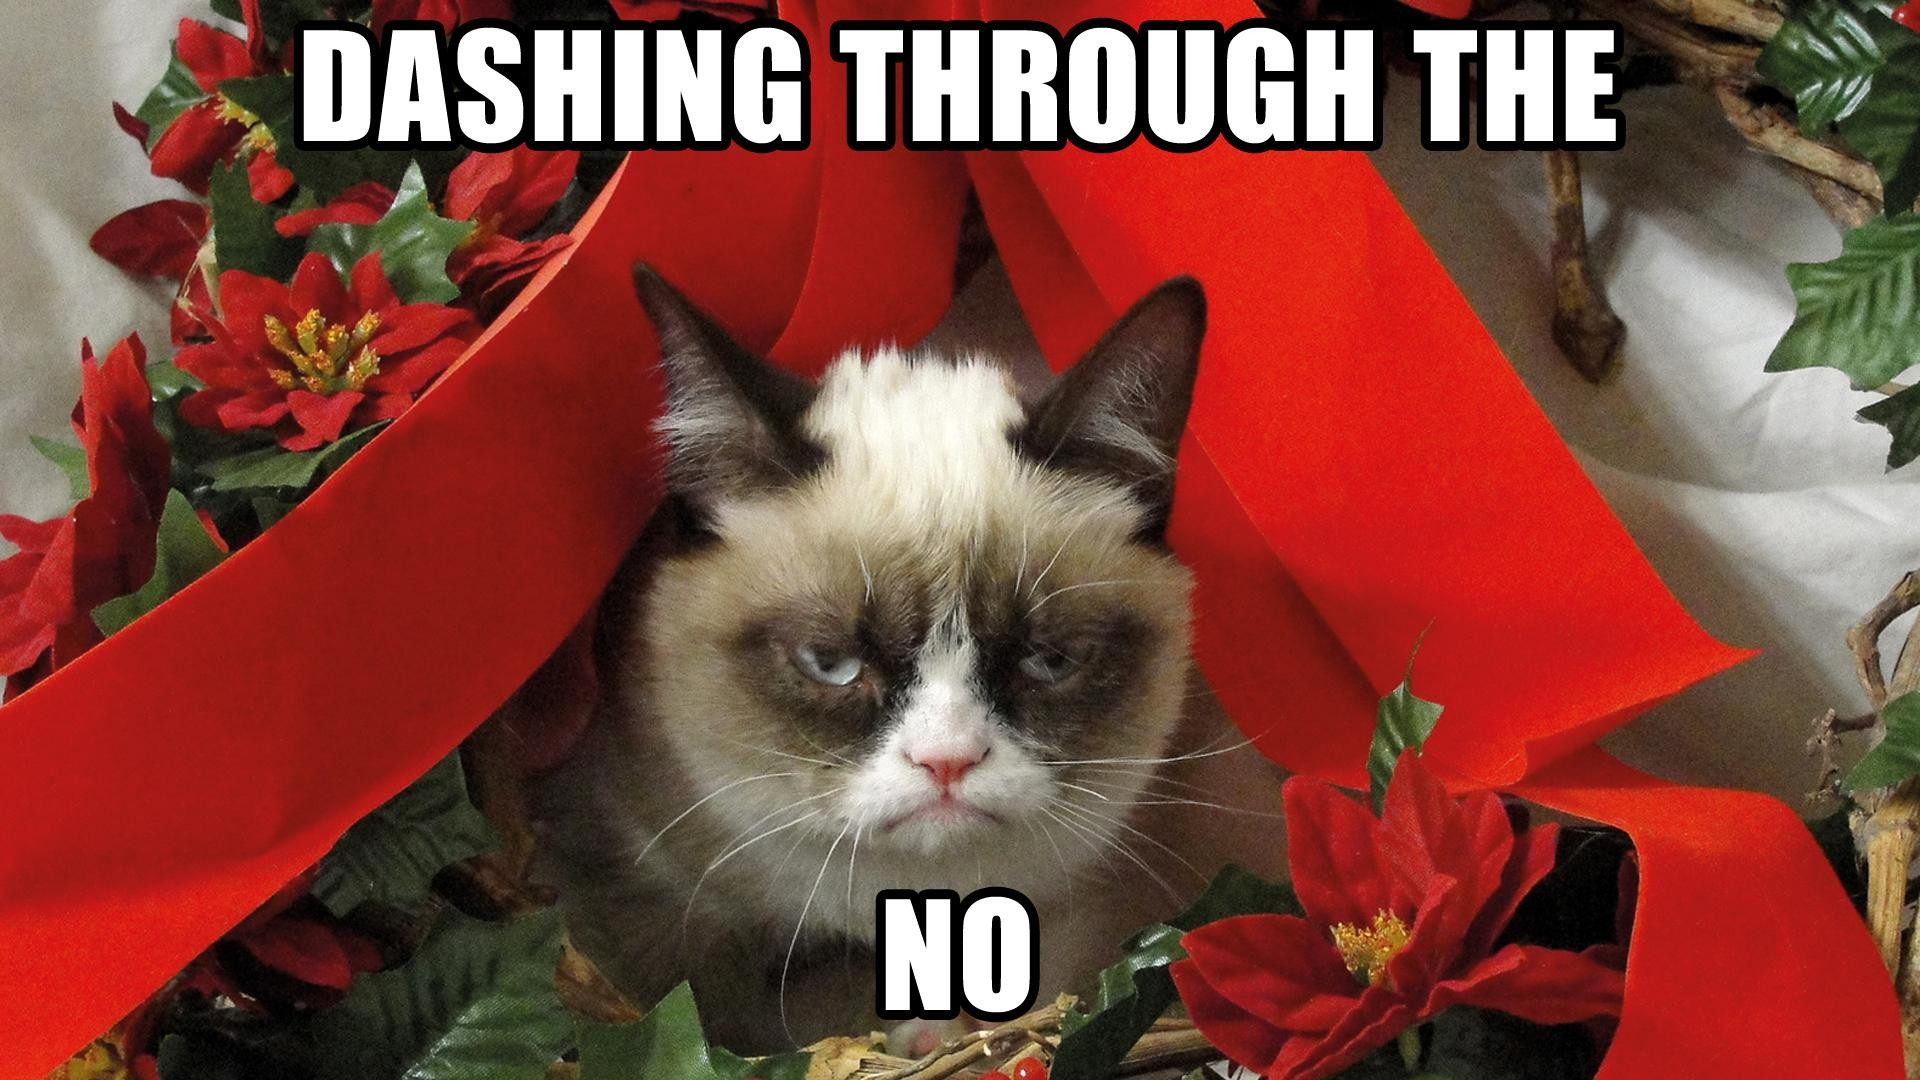 Grumpy Cat Meme Pictures humor funny cats christmas wallpaper | |  98020 | WallpaperUP